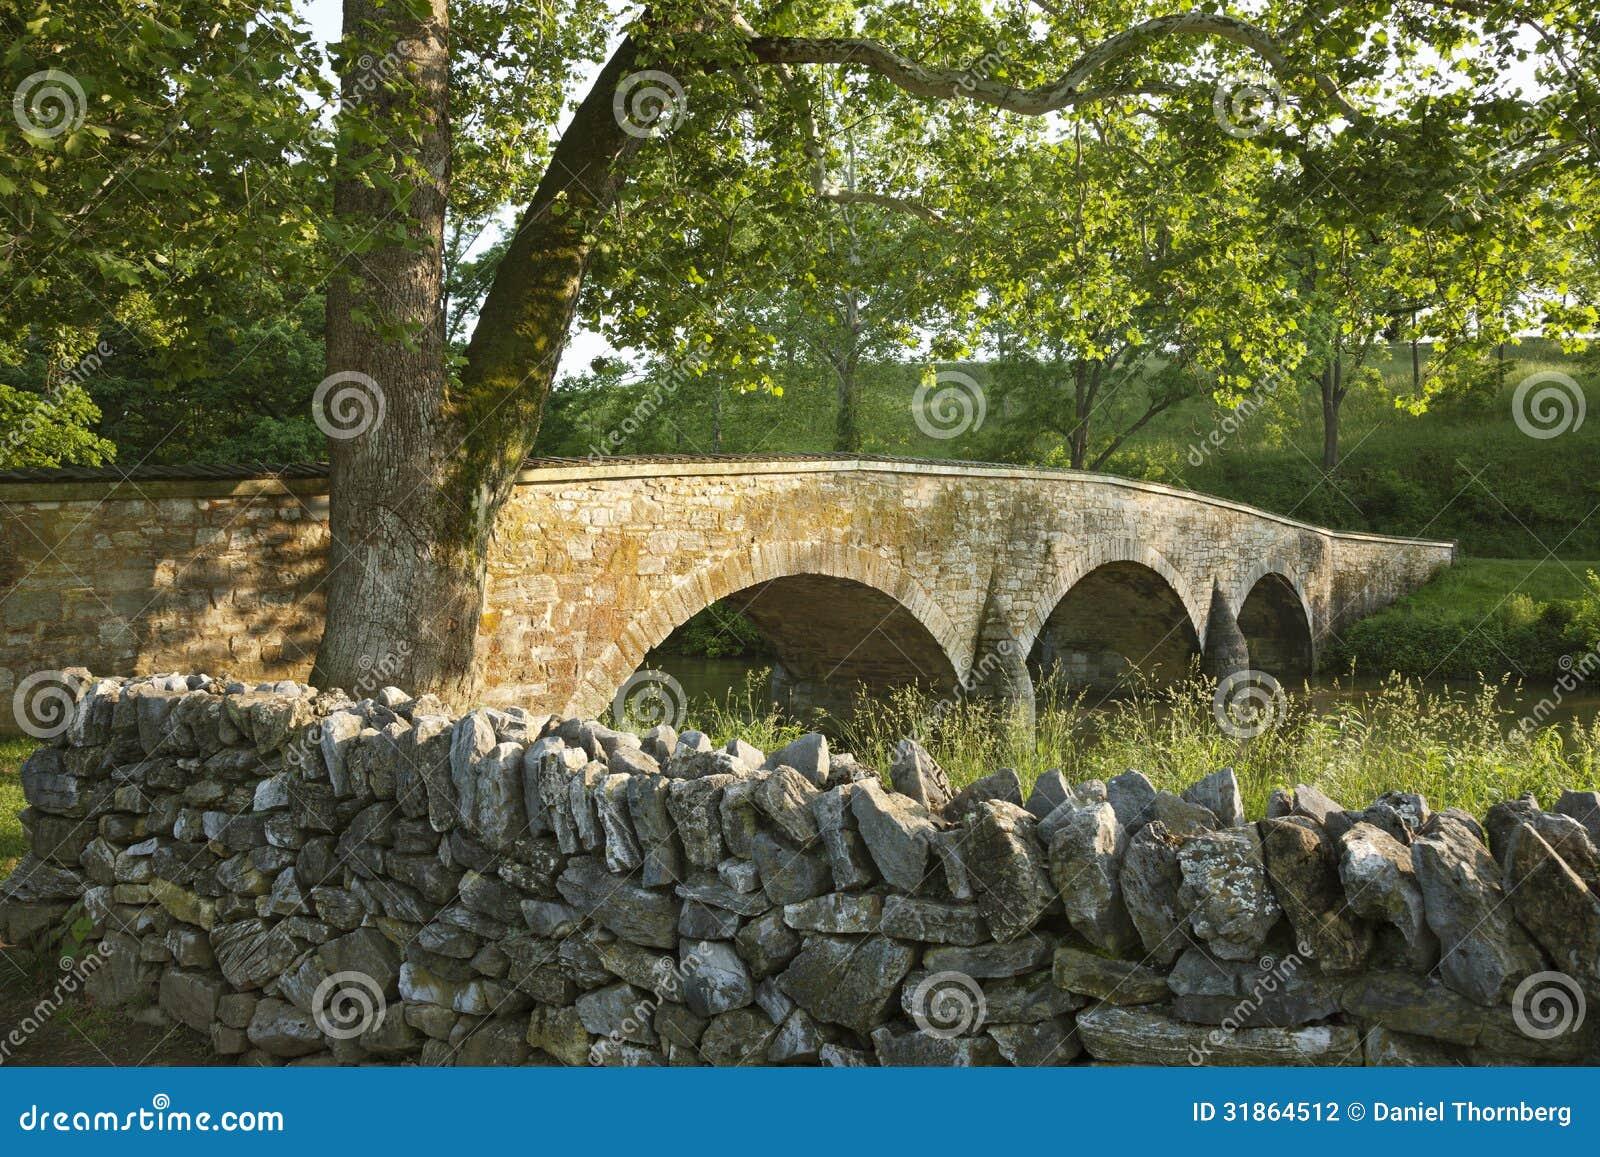 Burnside s Bridge at Antietam (Sharpsburg) Battlefield in Maryla